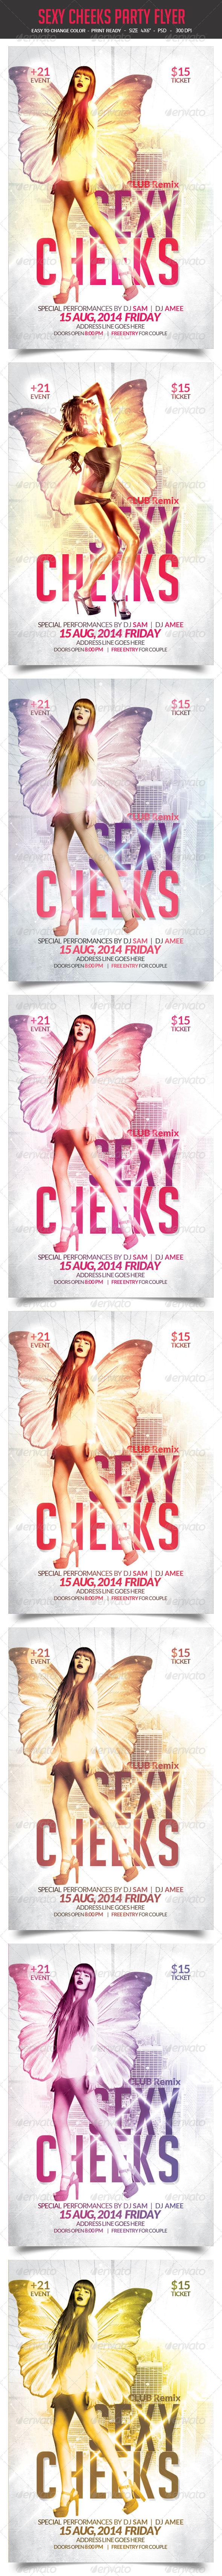 Sexy Cheeks Party Flyer Vol.2